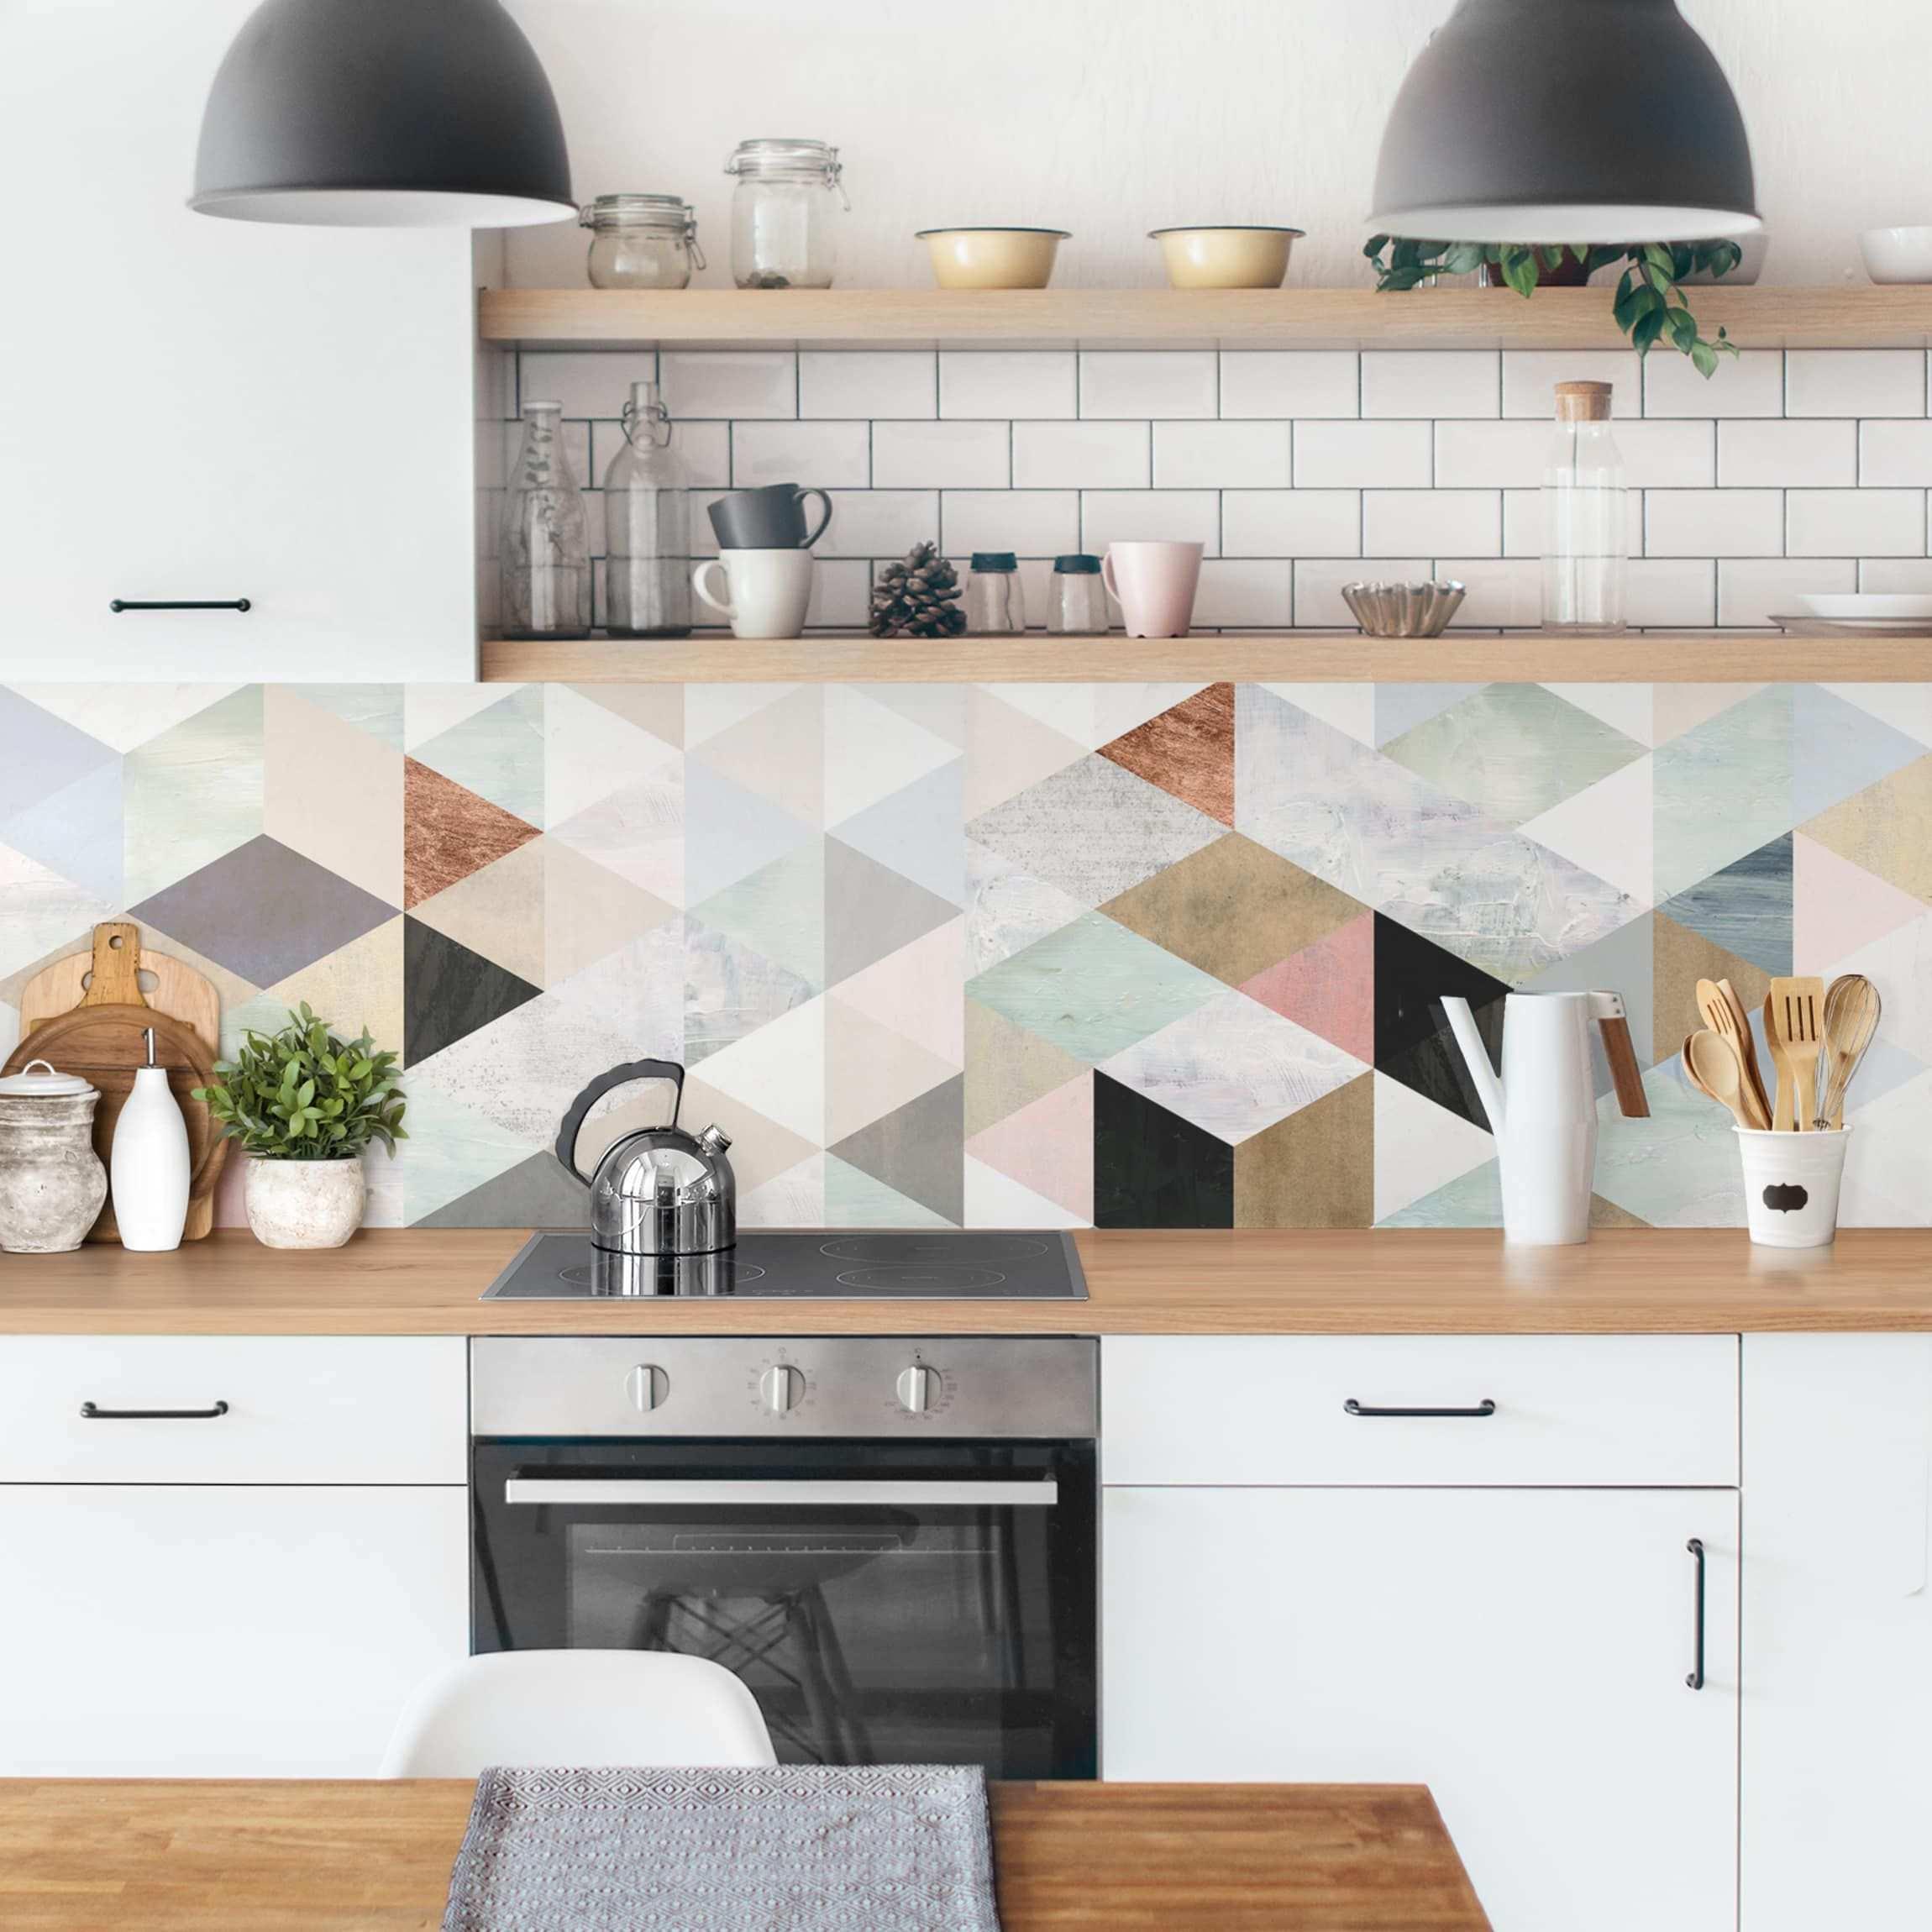 Kuchenruckwand Aquarell Mosaik Mit Dreiecken I Innenarchitektur Kuche Kuchenruckwand Kuche Mosaik